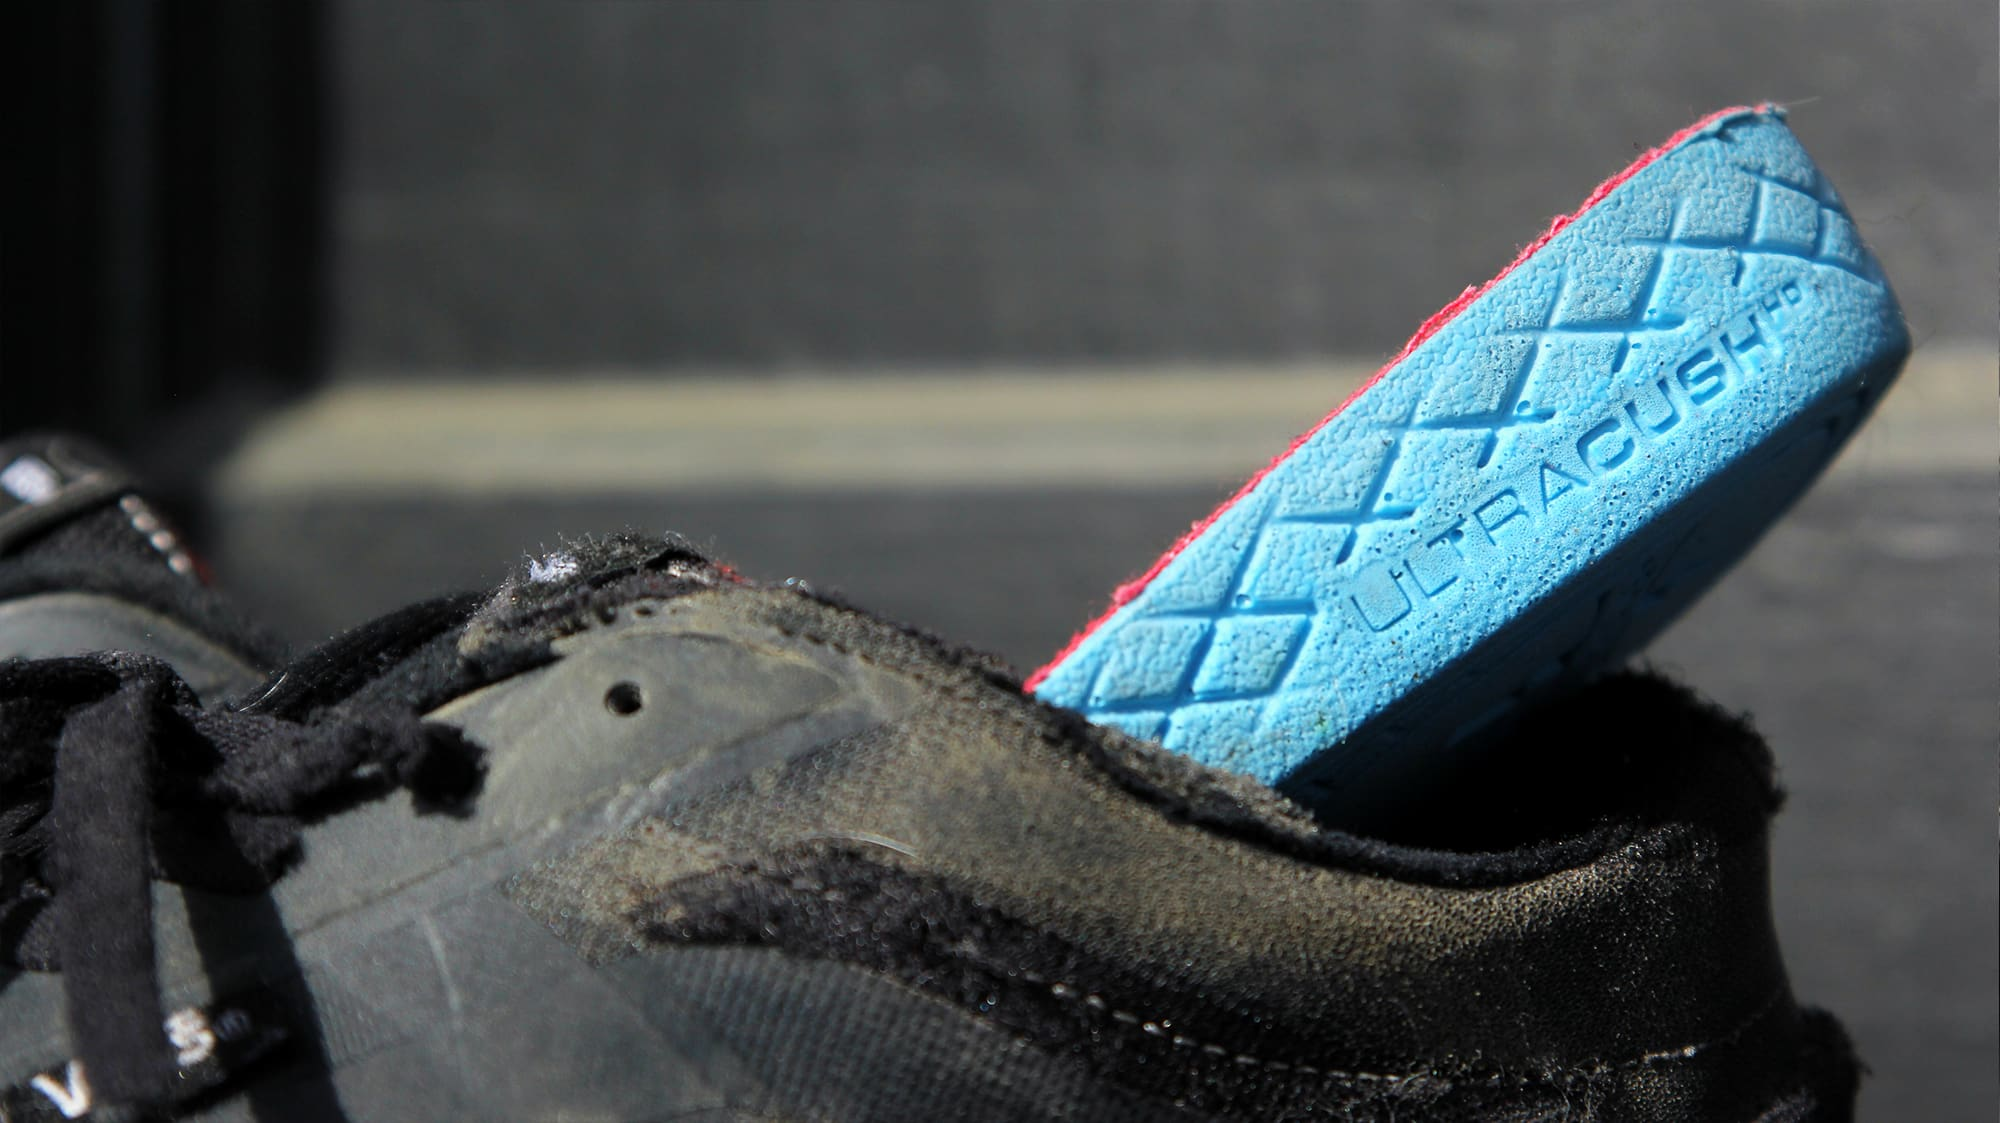 Vans AV Rapidweld Pro Lite Skate Shoes Wear Test Review  cb065737d